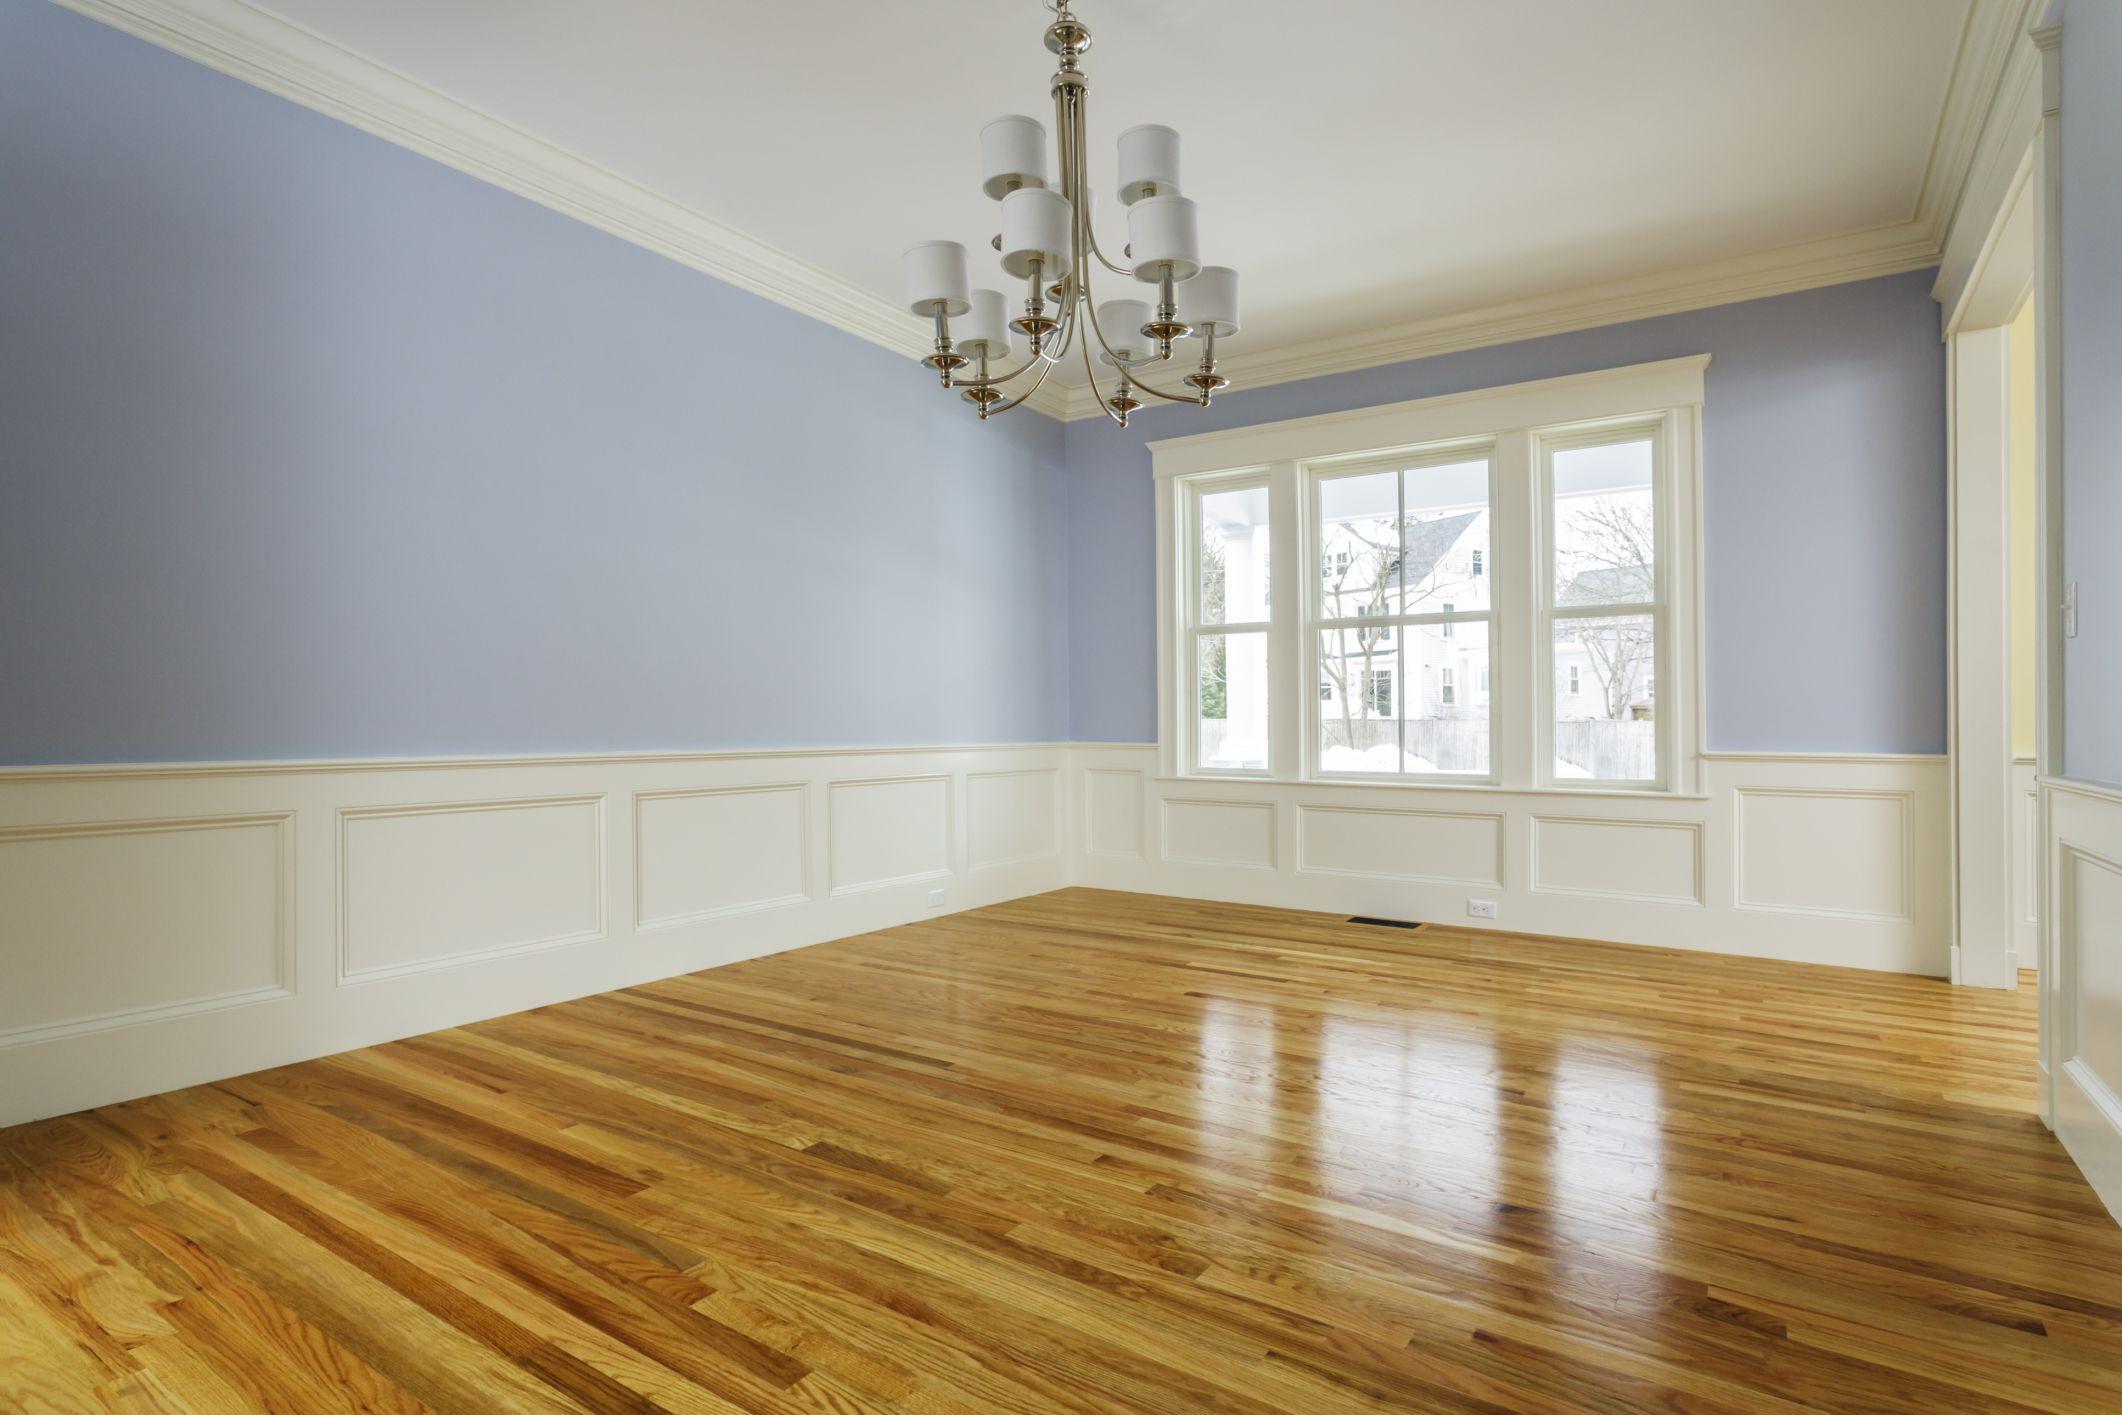 grey hand scraped hardwood floors of how to make hardwood floors shiny pertaining to 168686572 56a4e87c3df78cf7728544a2